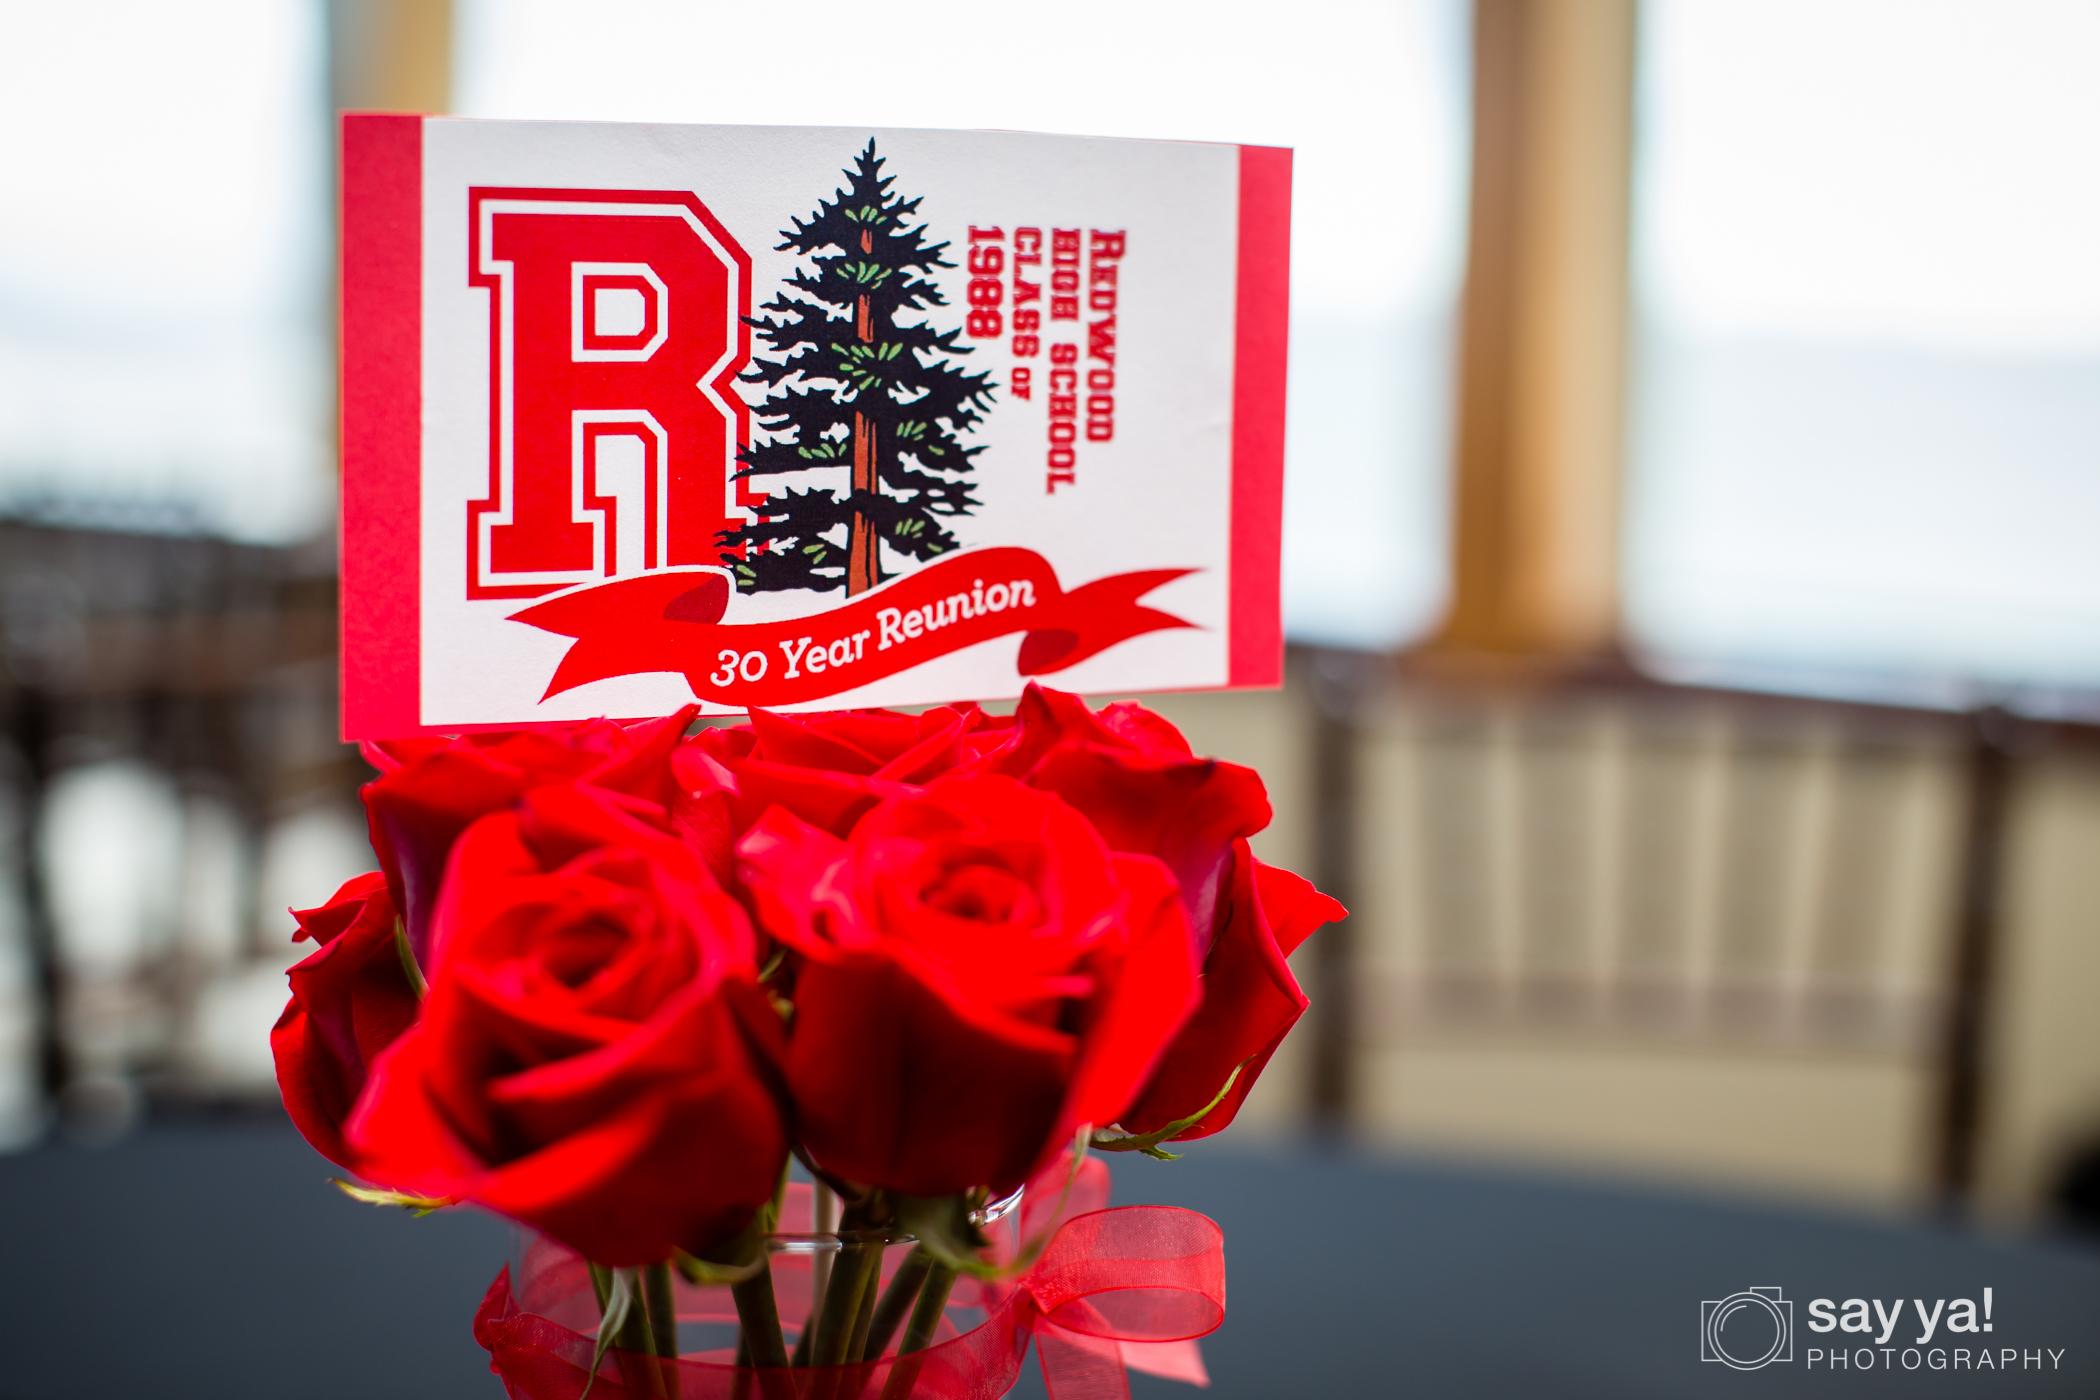 RHS Class of 1988 30 Year Reunion